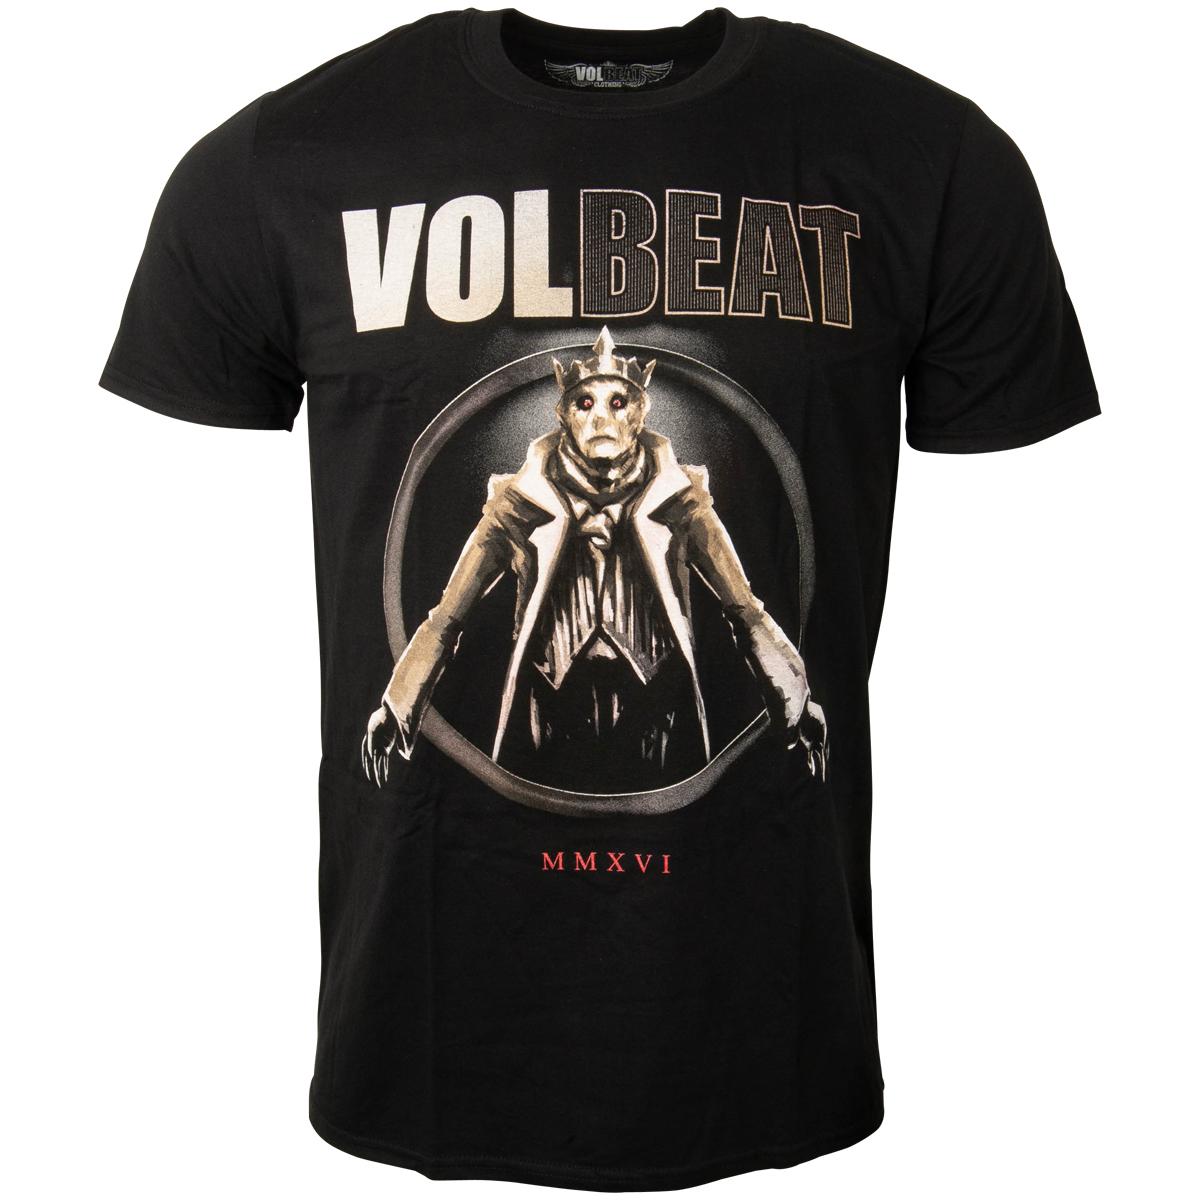 Volbeat - T-Shirt King Of The Beast - schwarz